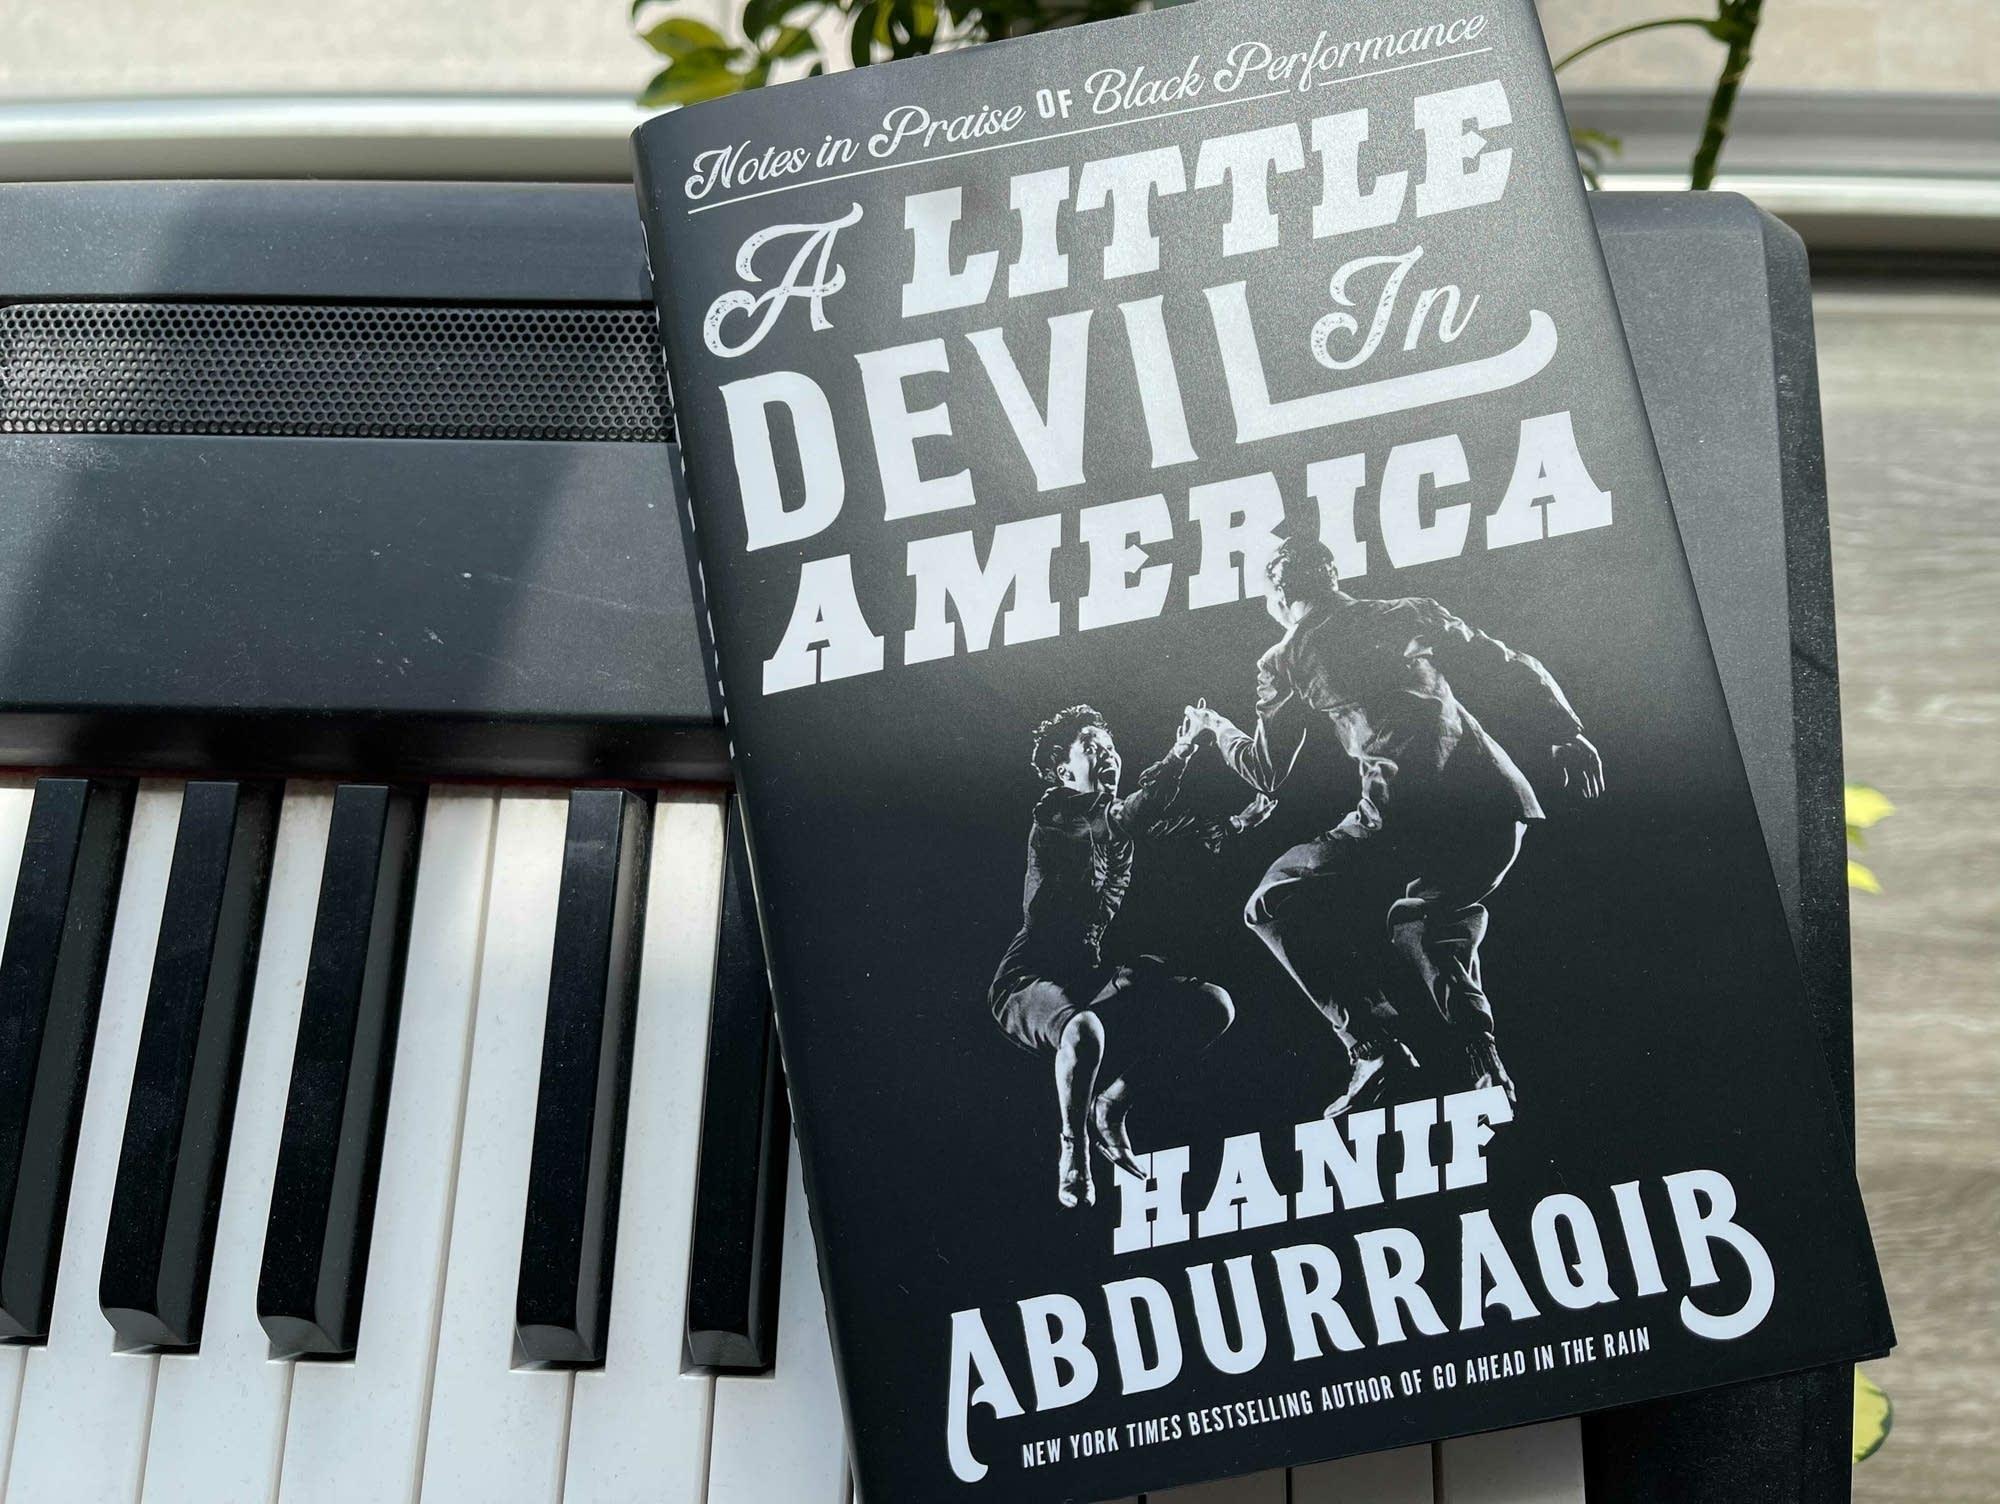 Hanif Abdurraqib book 'A Little Devil in America' on keyboard.